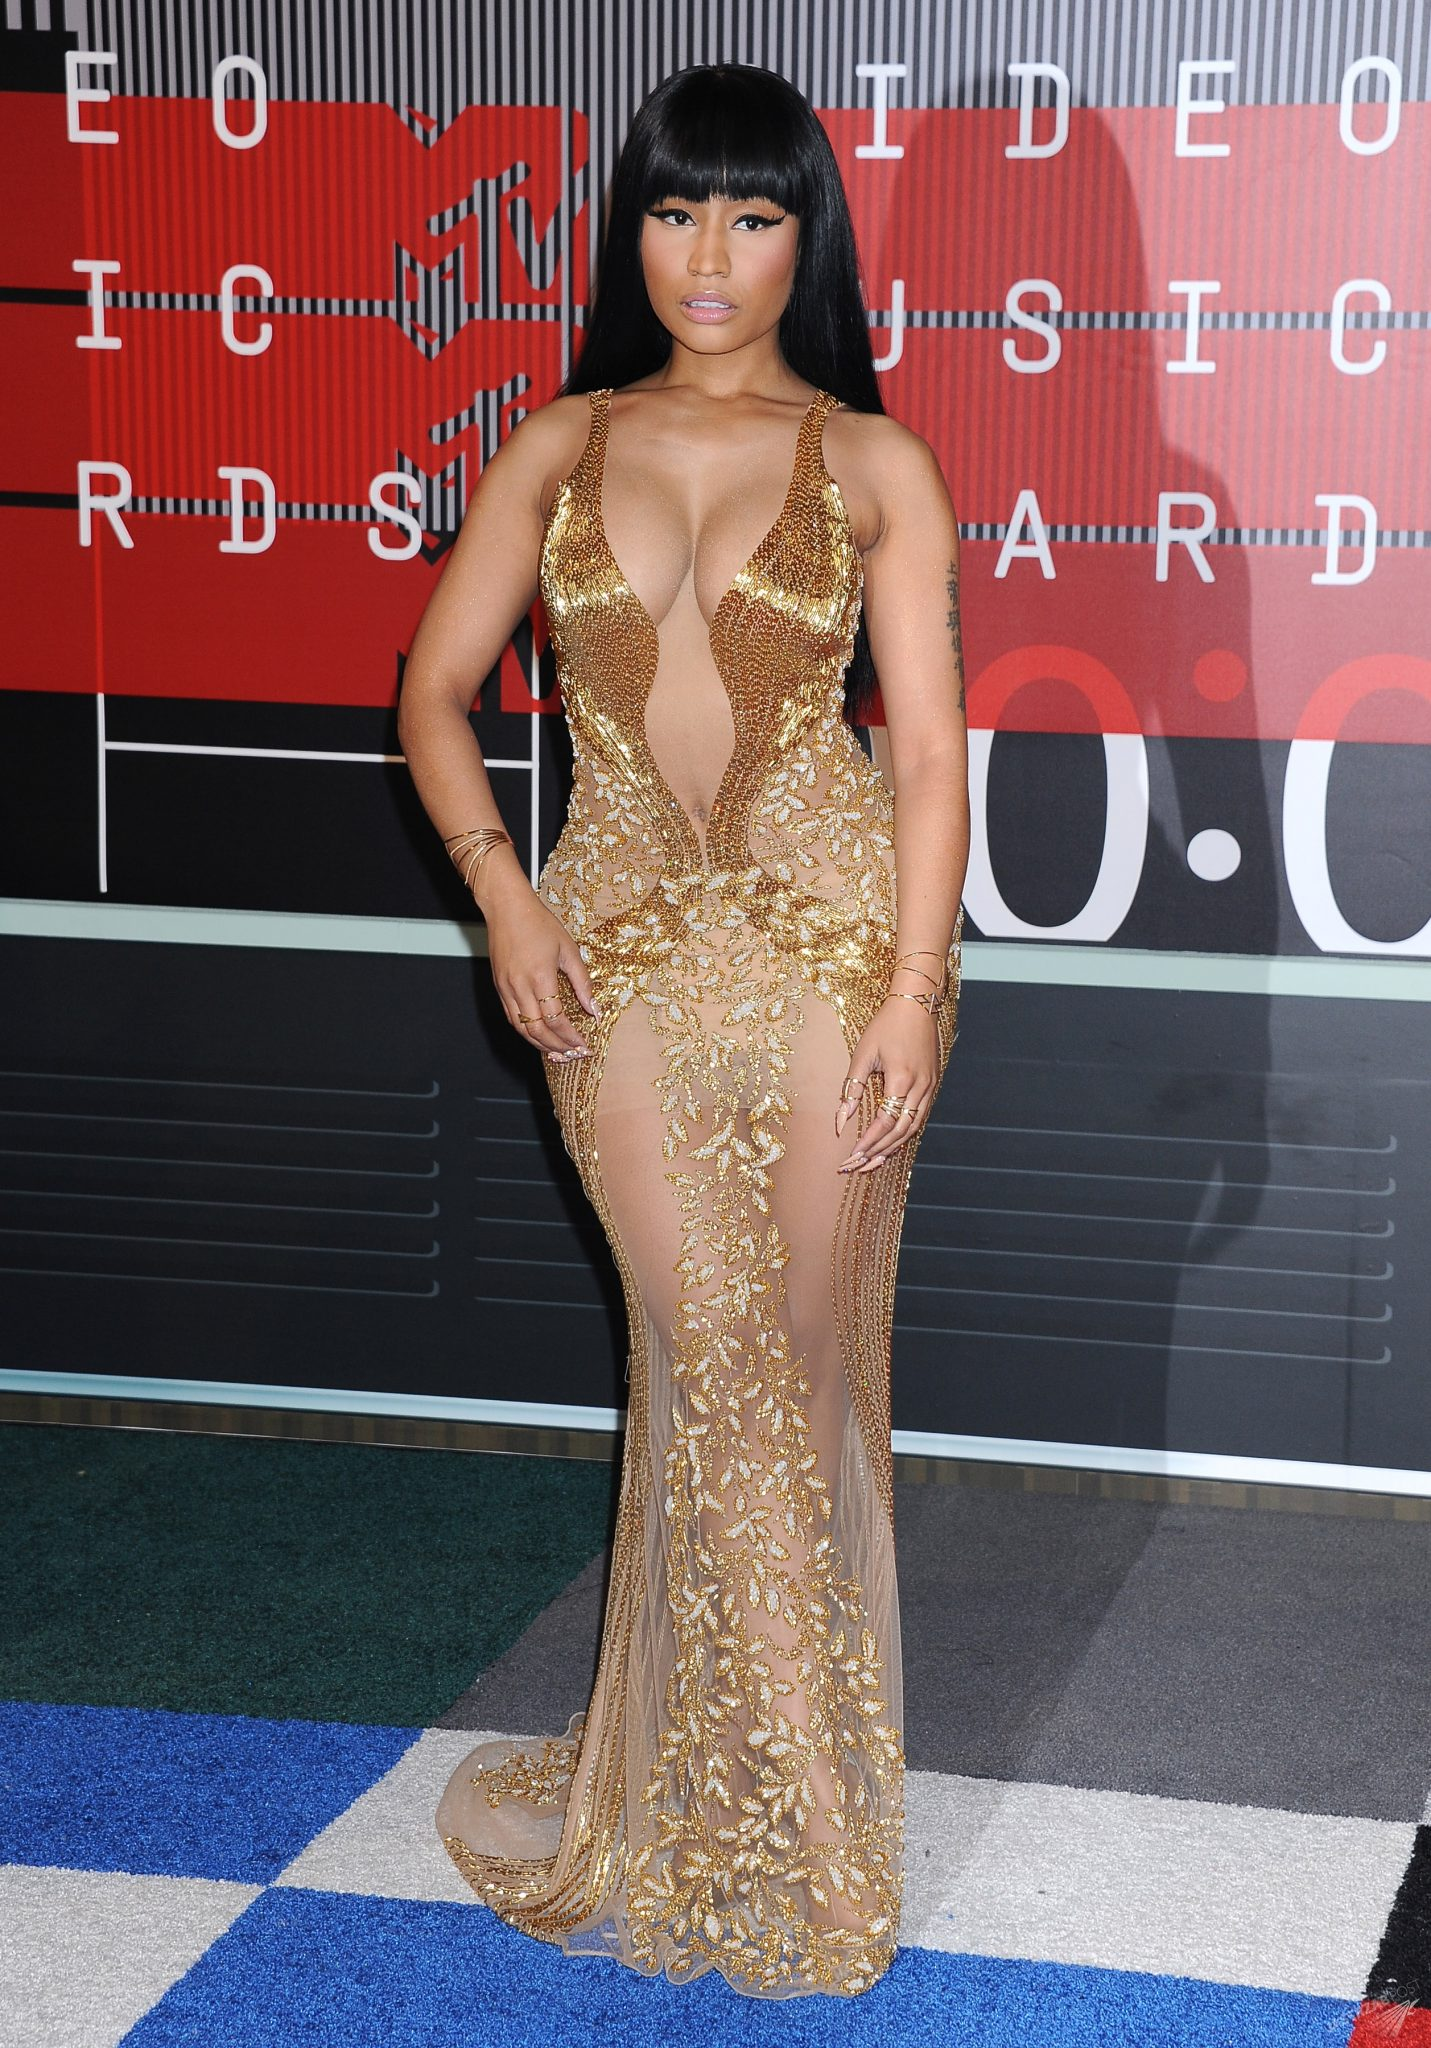 Nicki Minaj komentuje parodię Adele